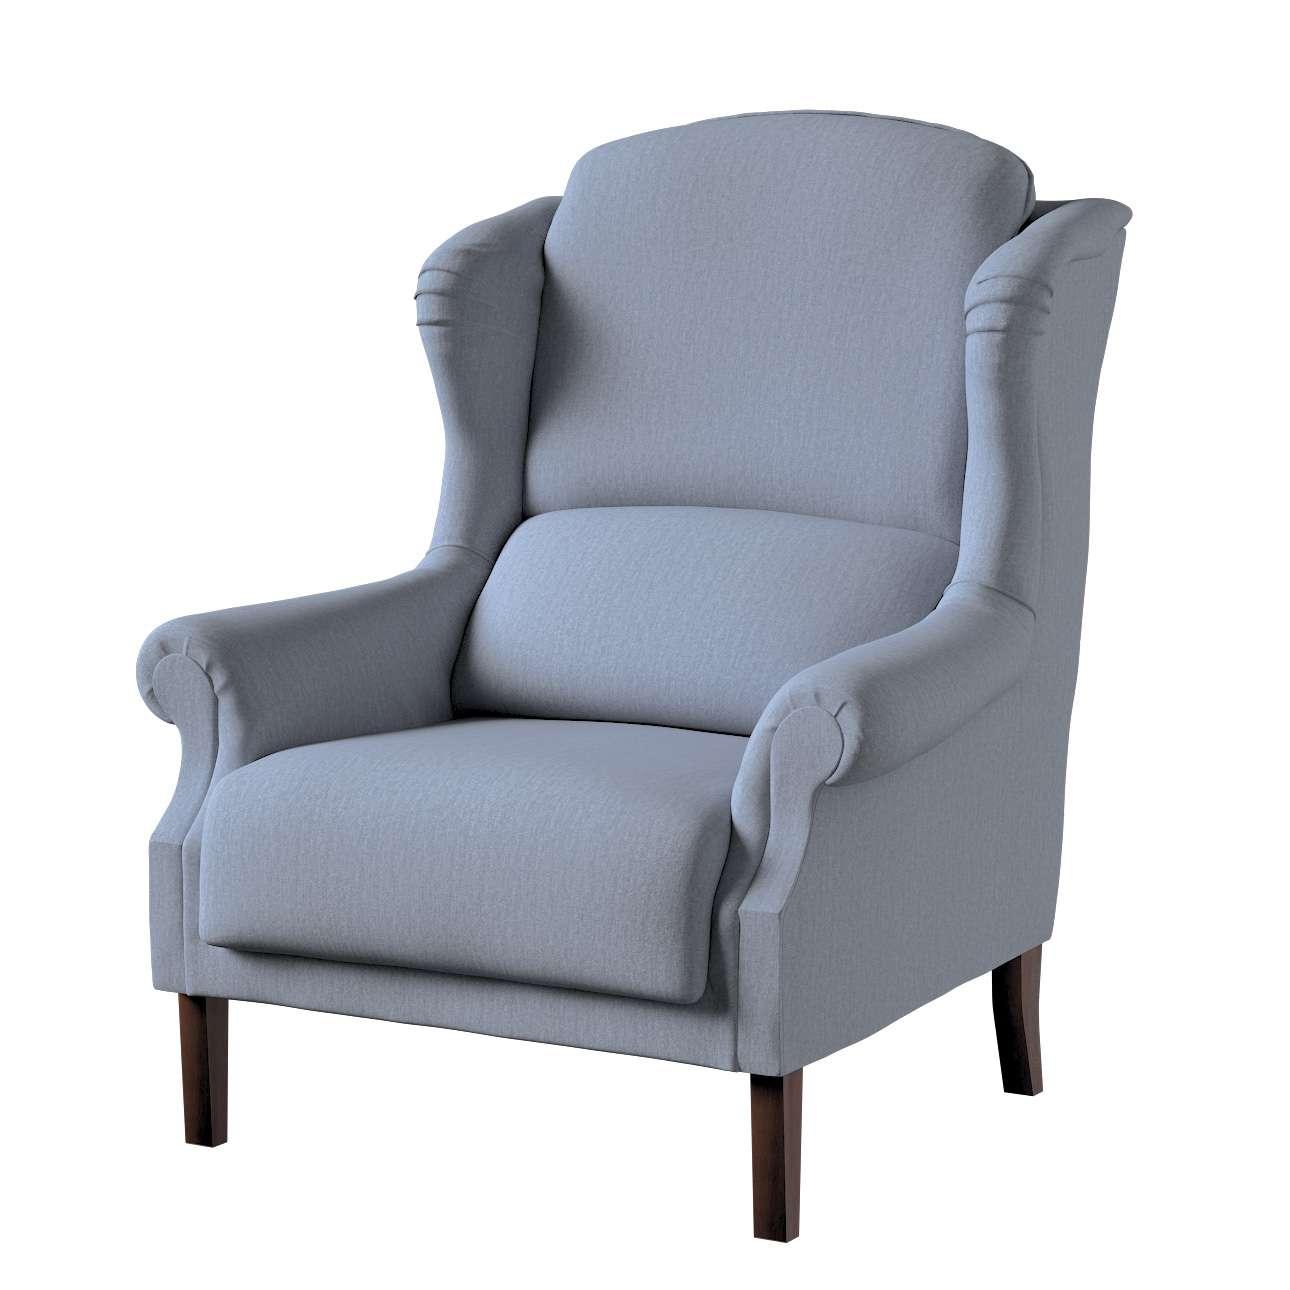 Sessel, silber- blau, 85 x 107 cm, Chenille